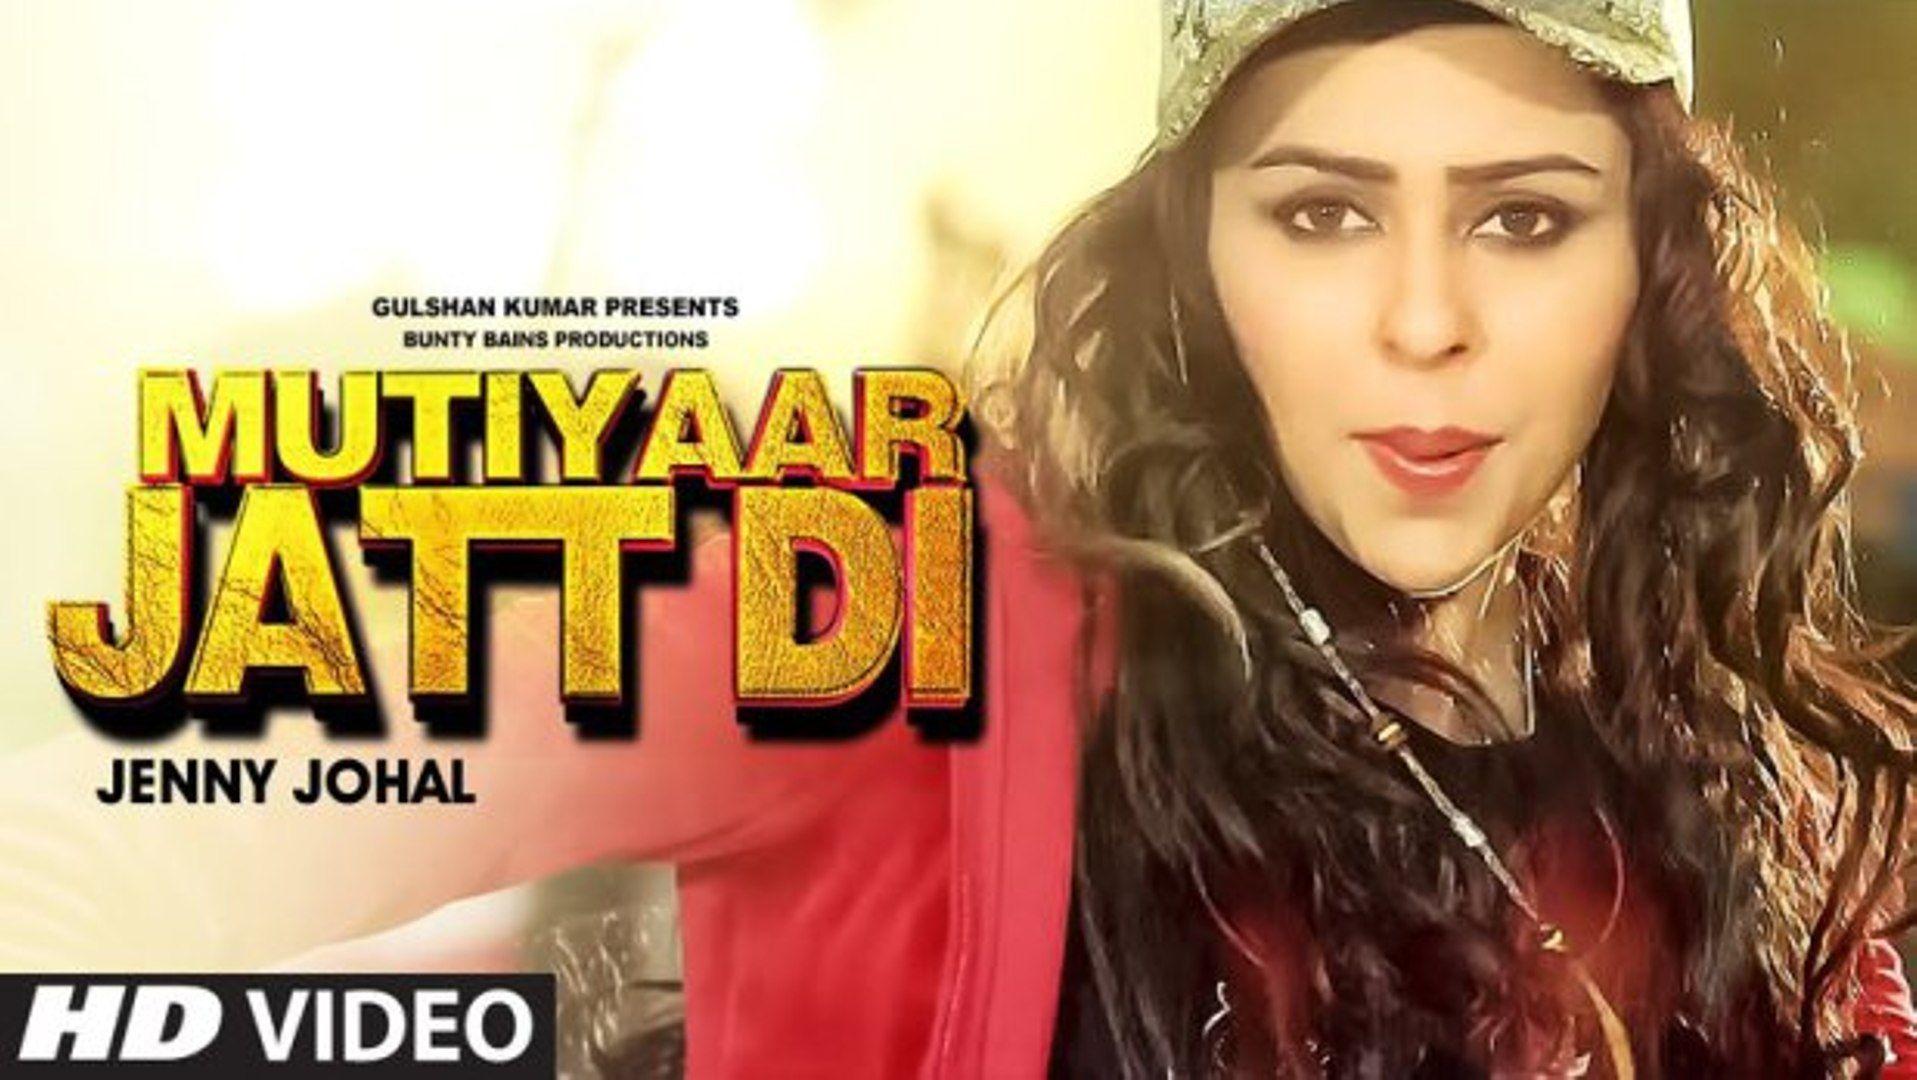 Listen To Punjabi Music Songs Latest Mp3 Download Free App Music Songs Songs Top Singer